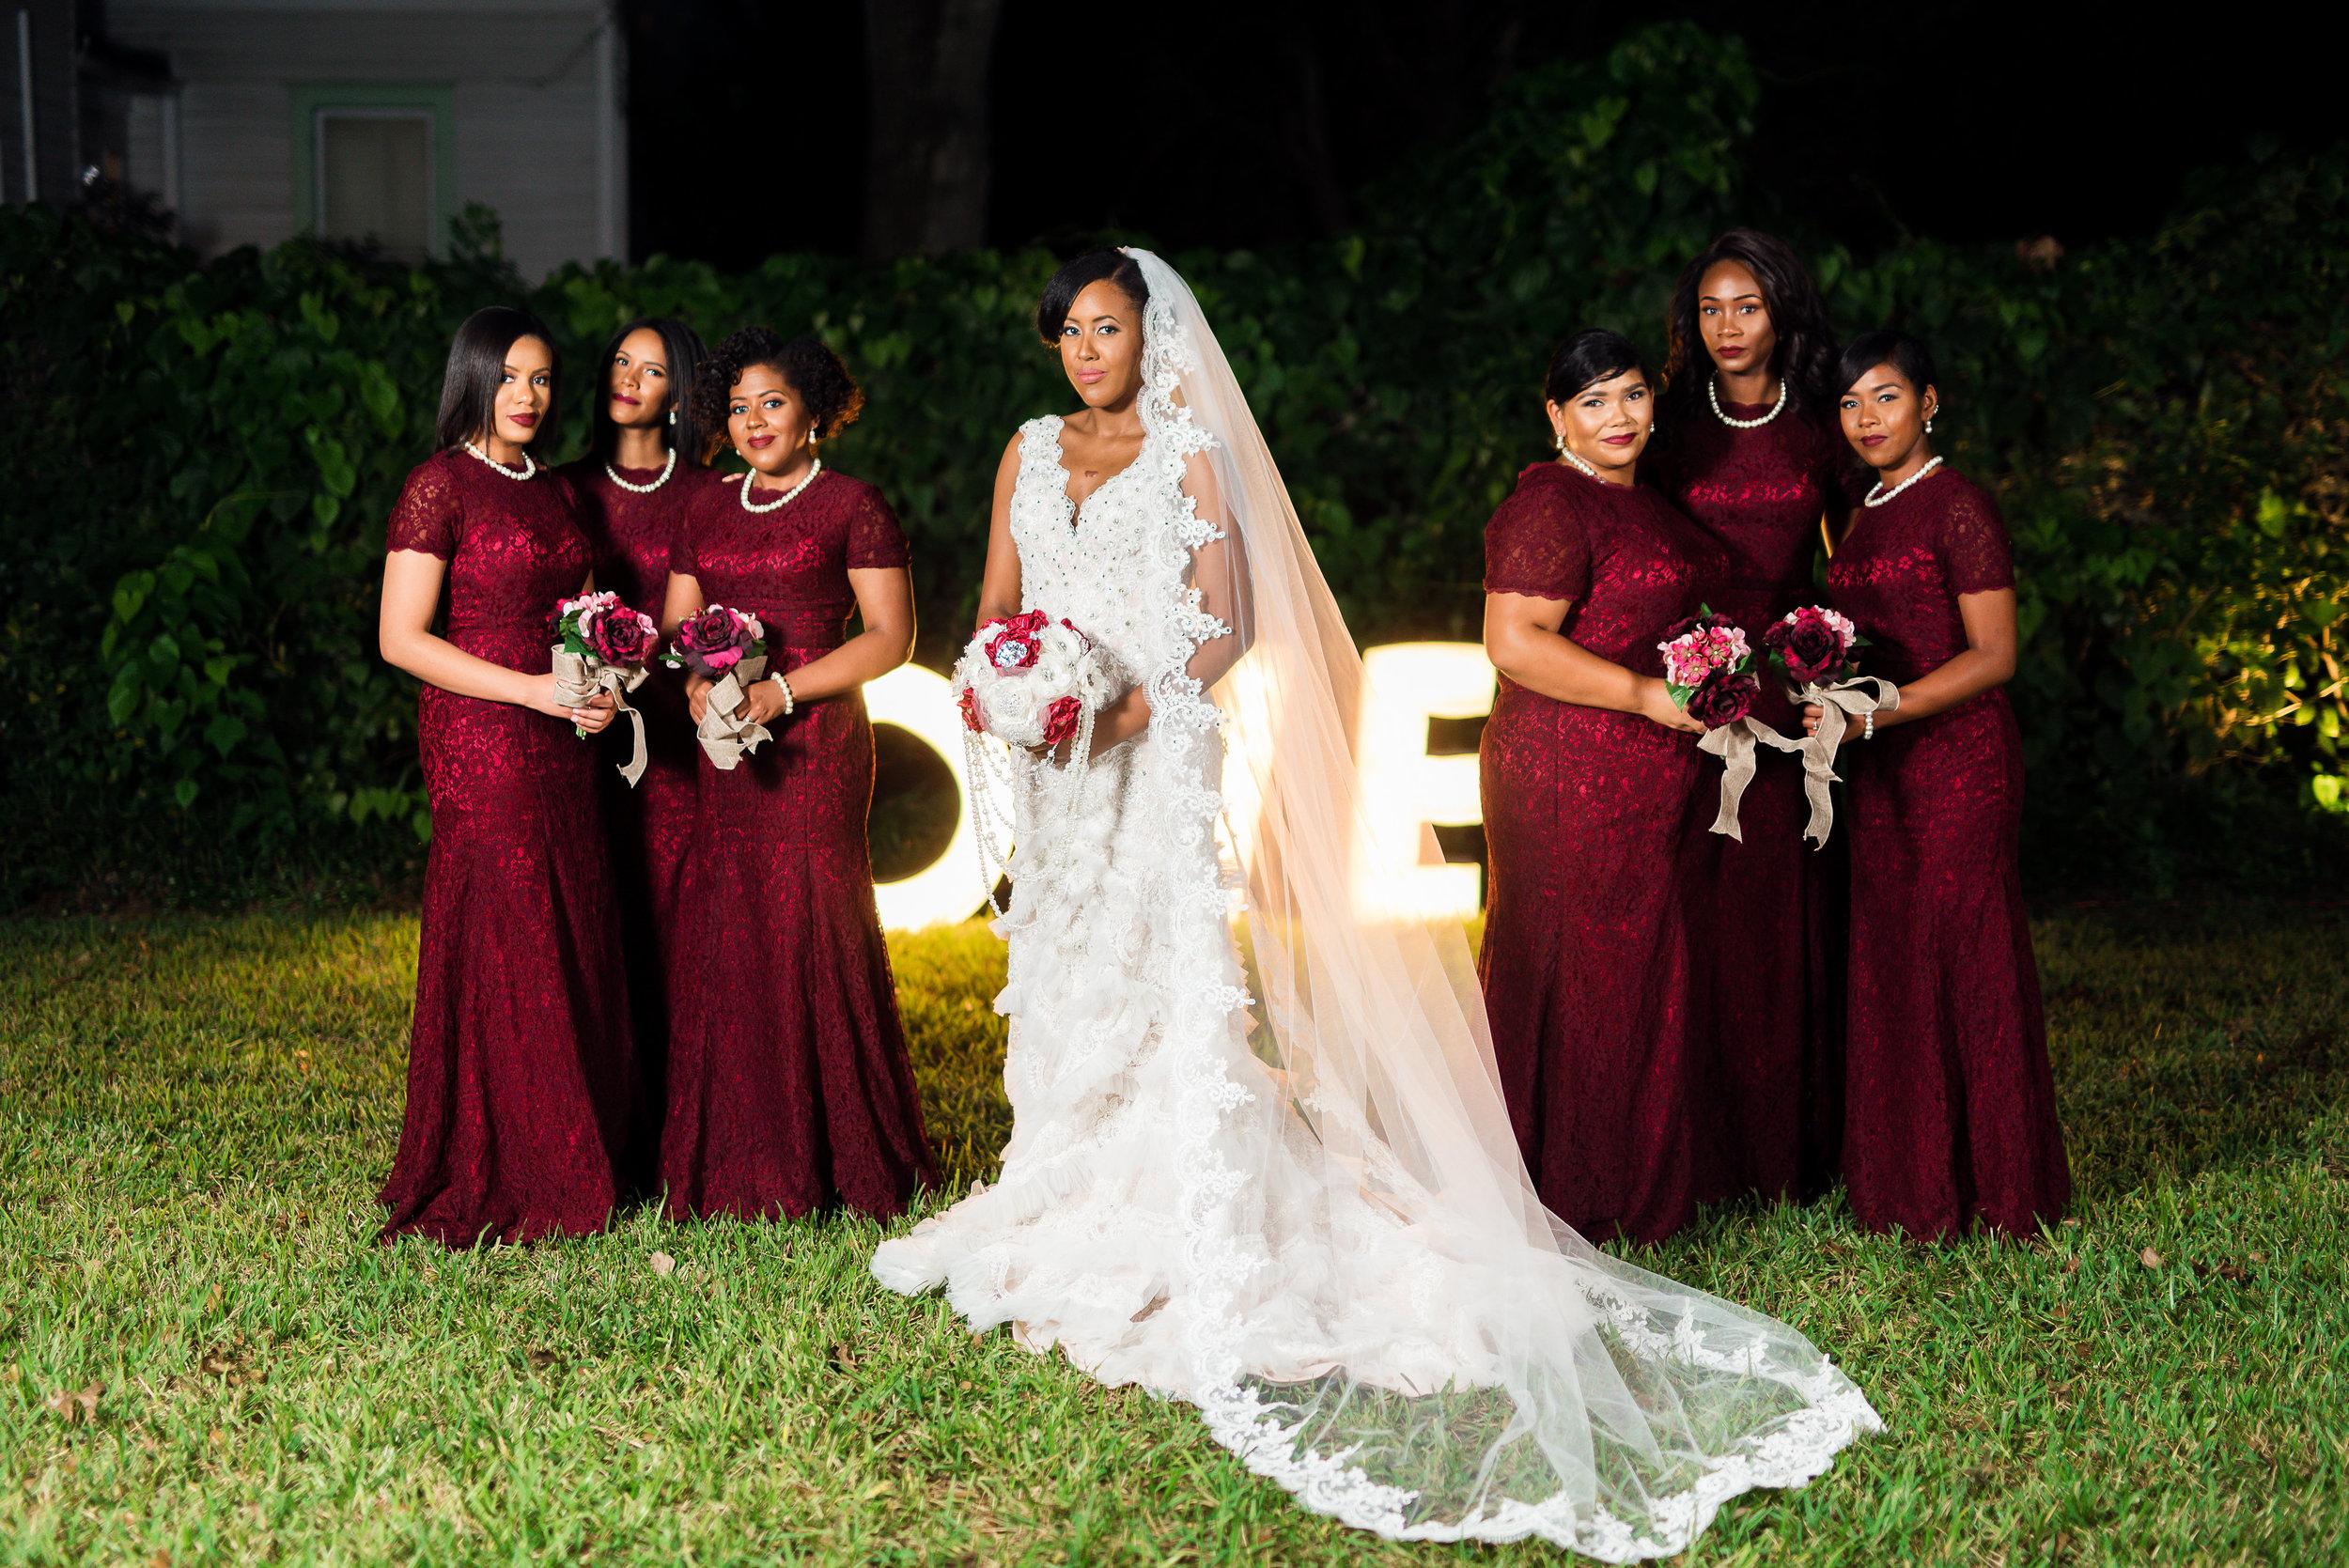 TC-Jessica-Garr-Pharris-Photography-Real-Wedding-33.jpg